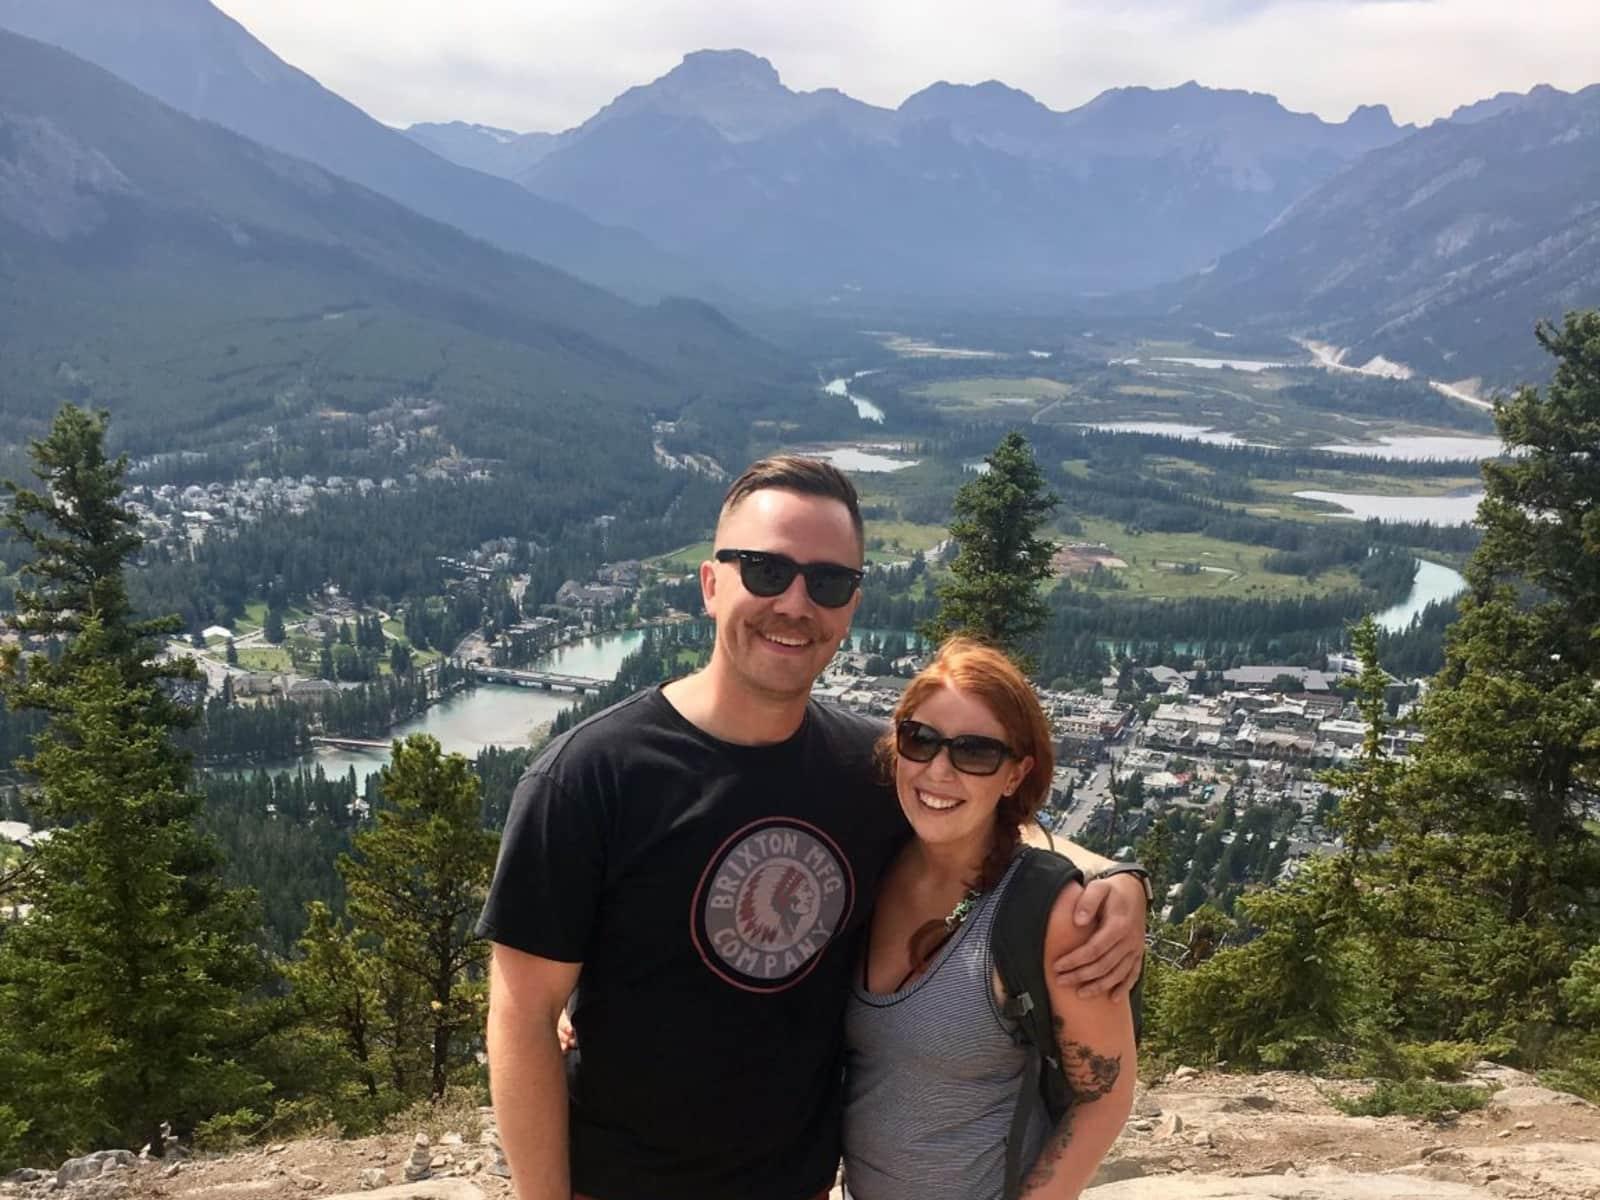 Andy & Sean from Saskatoon, Saskatchewan, Canada